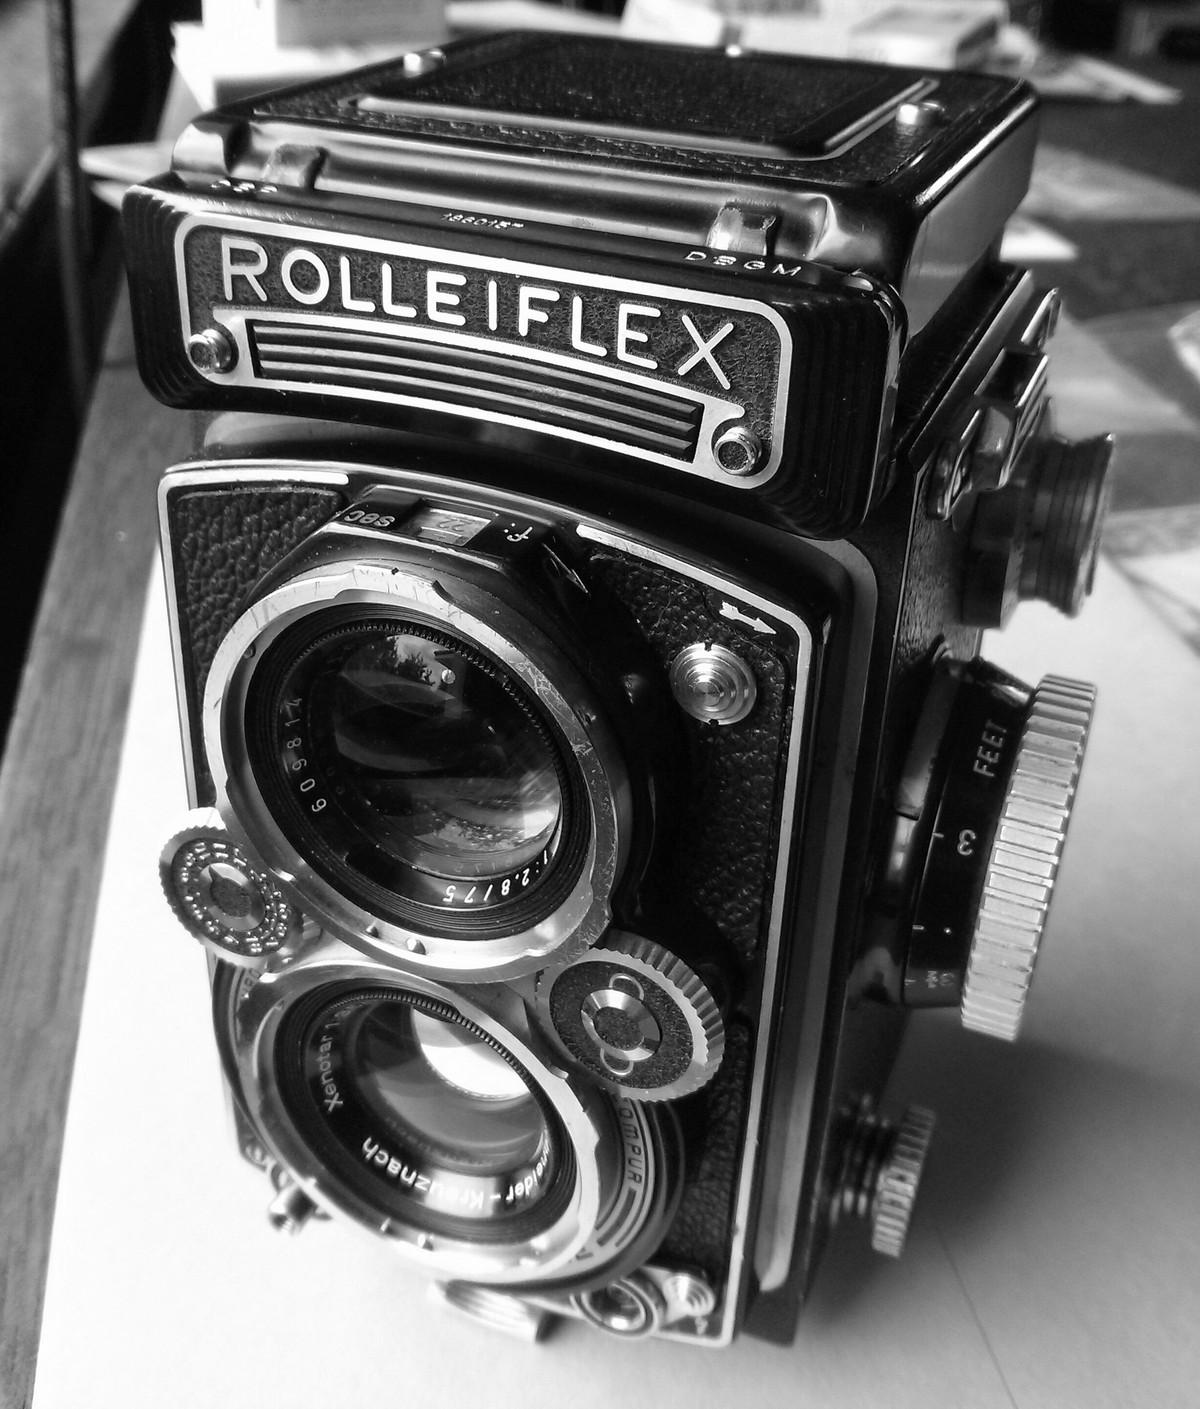 IMG_20160511_135649_Rolleiflex_BW_resize.jpg